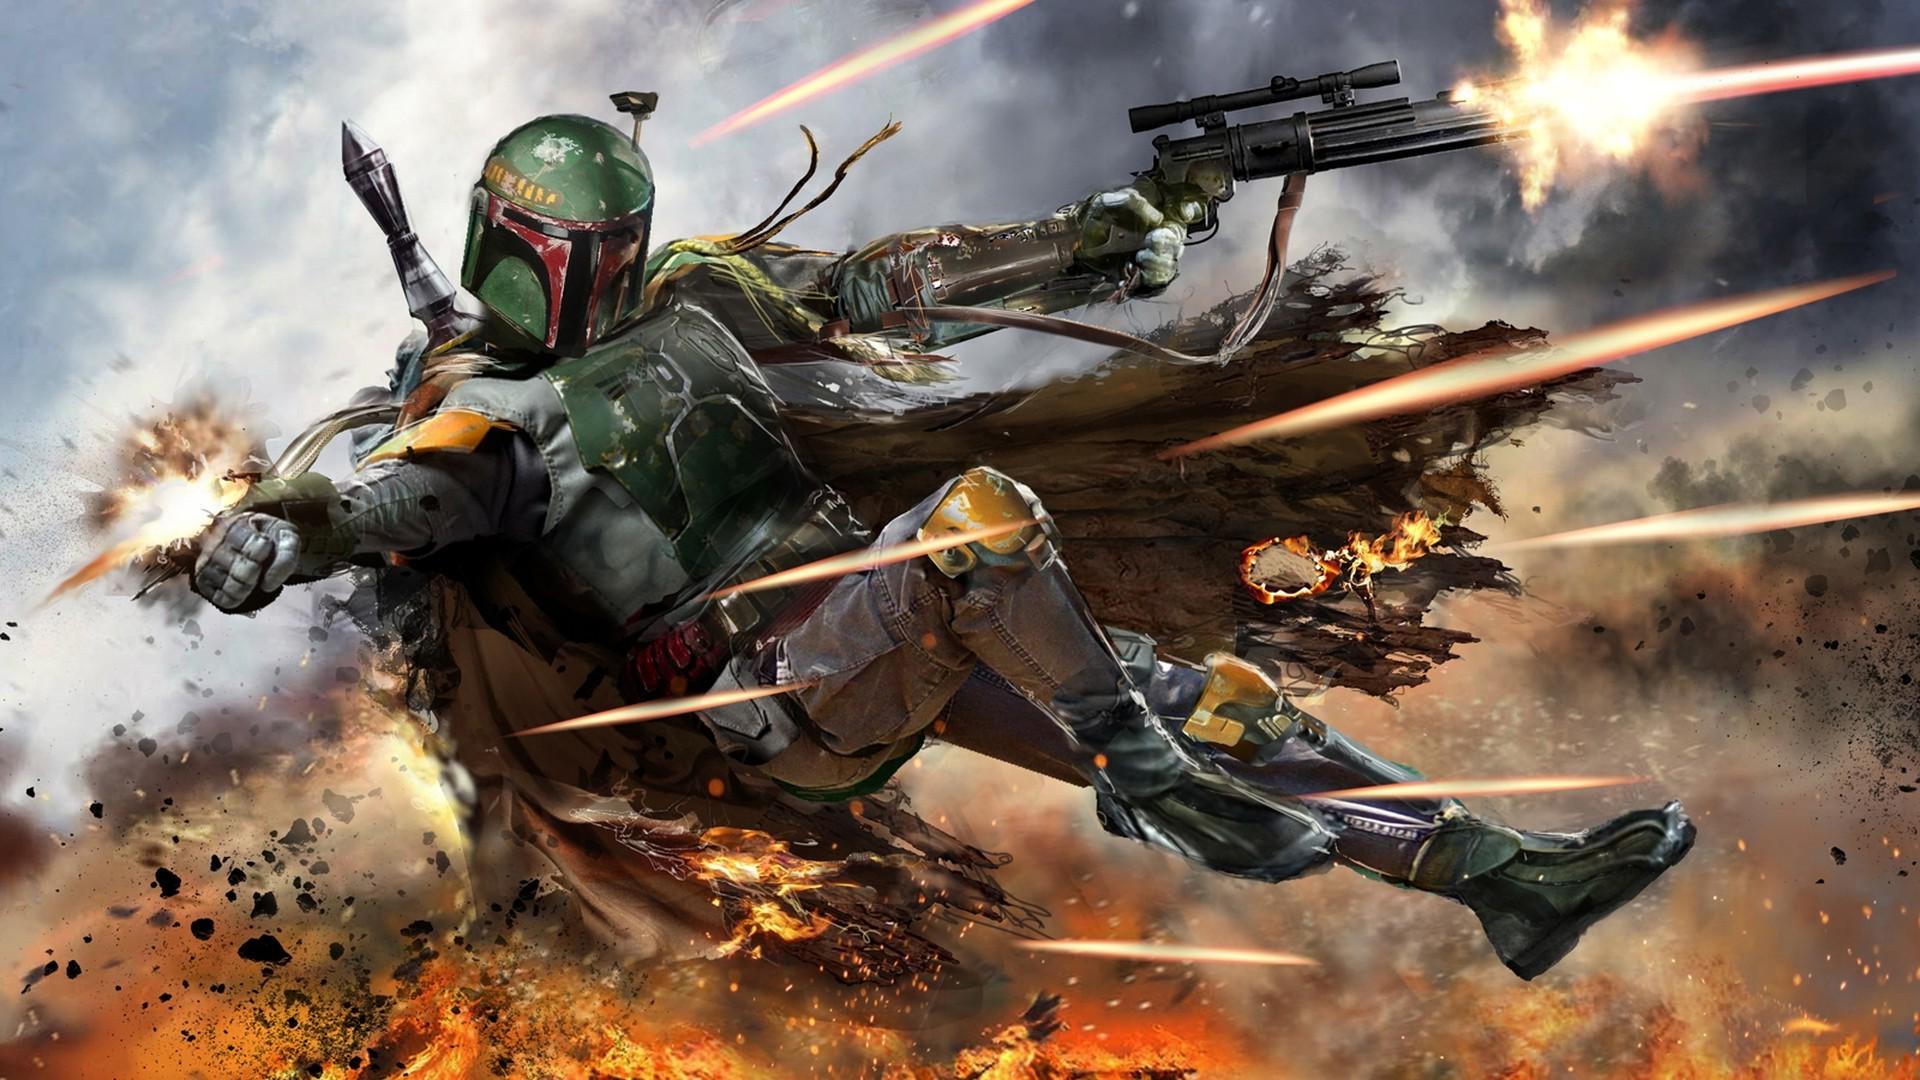 Star Wars Bounty Hunter Wallpaper 71 Images